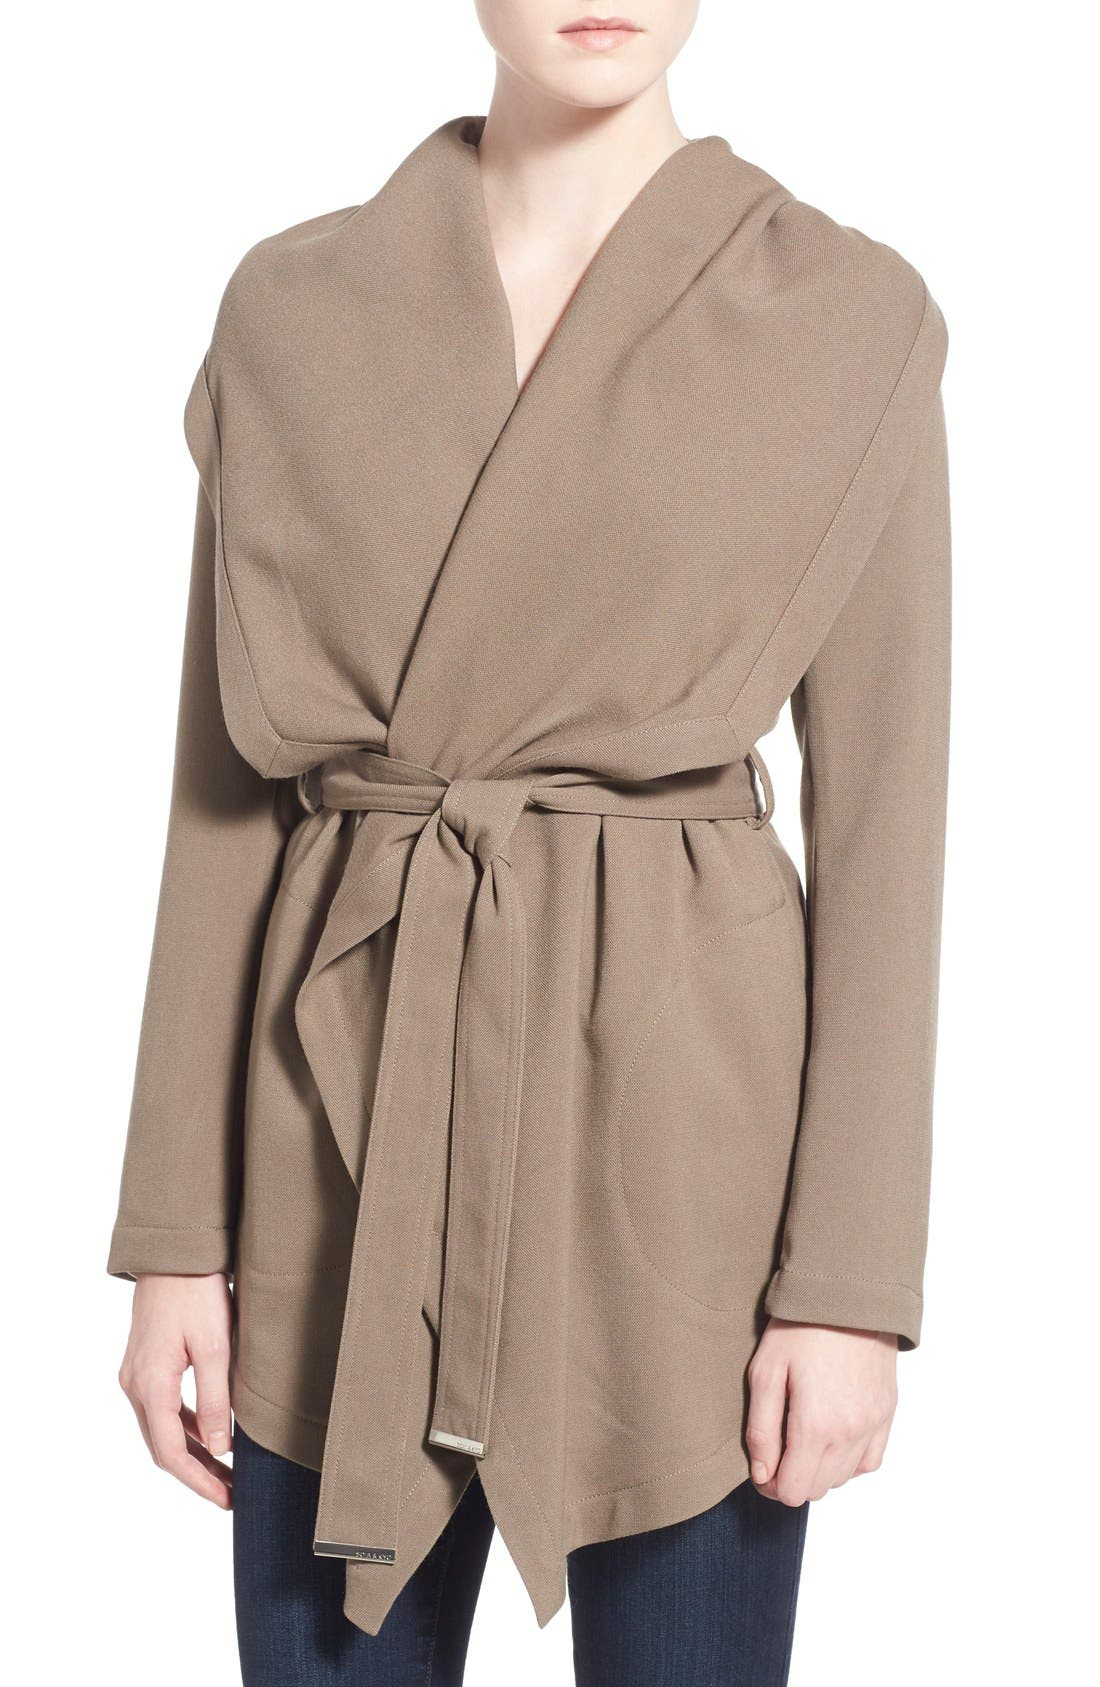 Alternate Image 1 Selected - Soia & Kyo Hip Length Drapey Hooded Wrap Coat